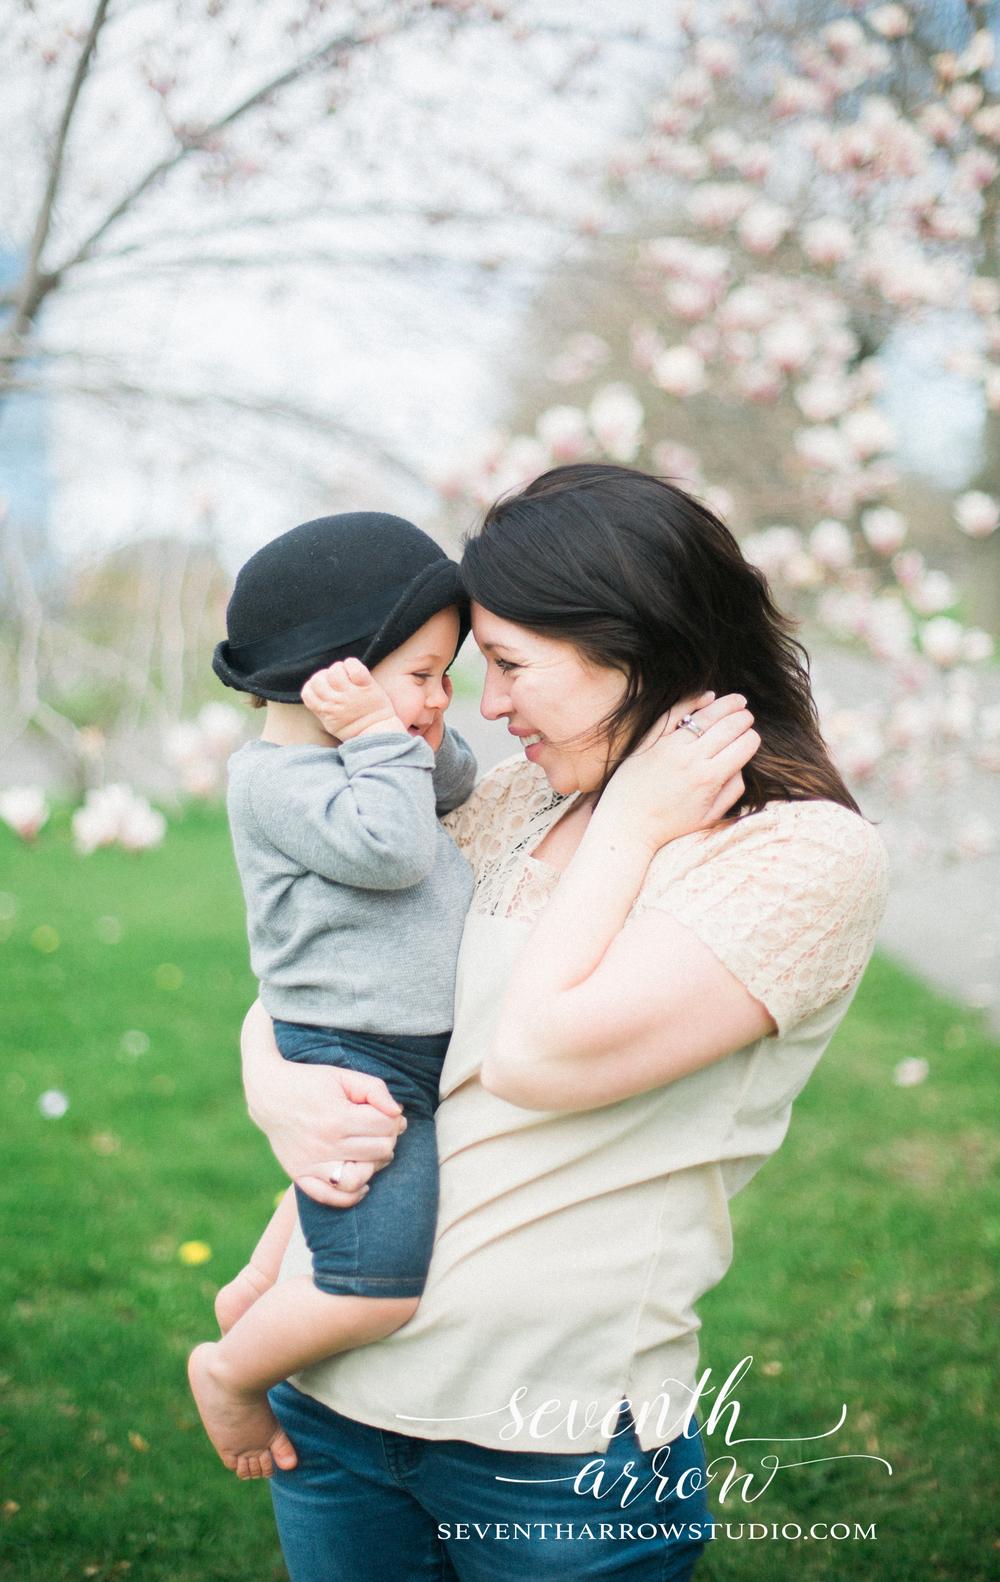 Mommyandme-9607.jpg